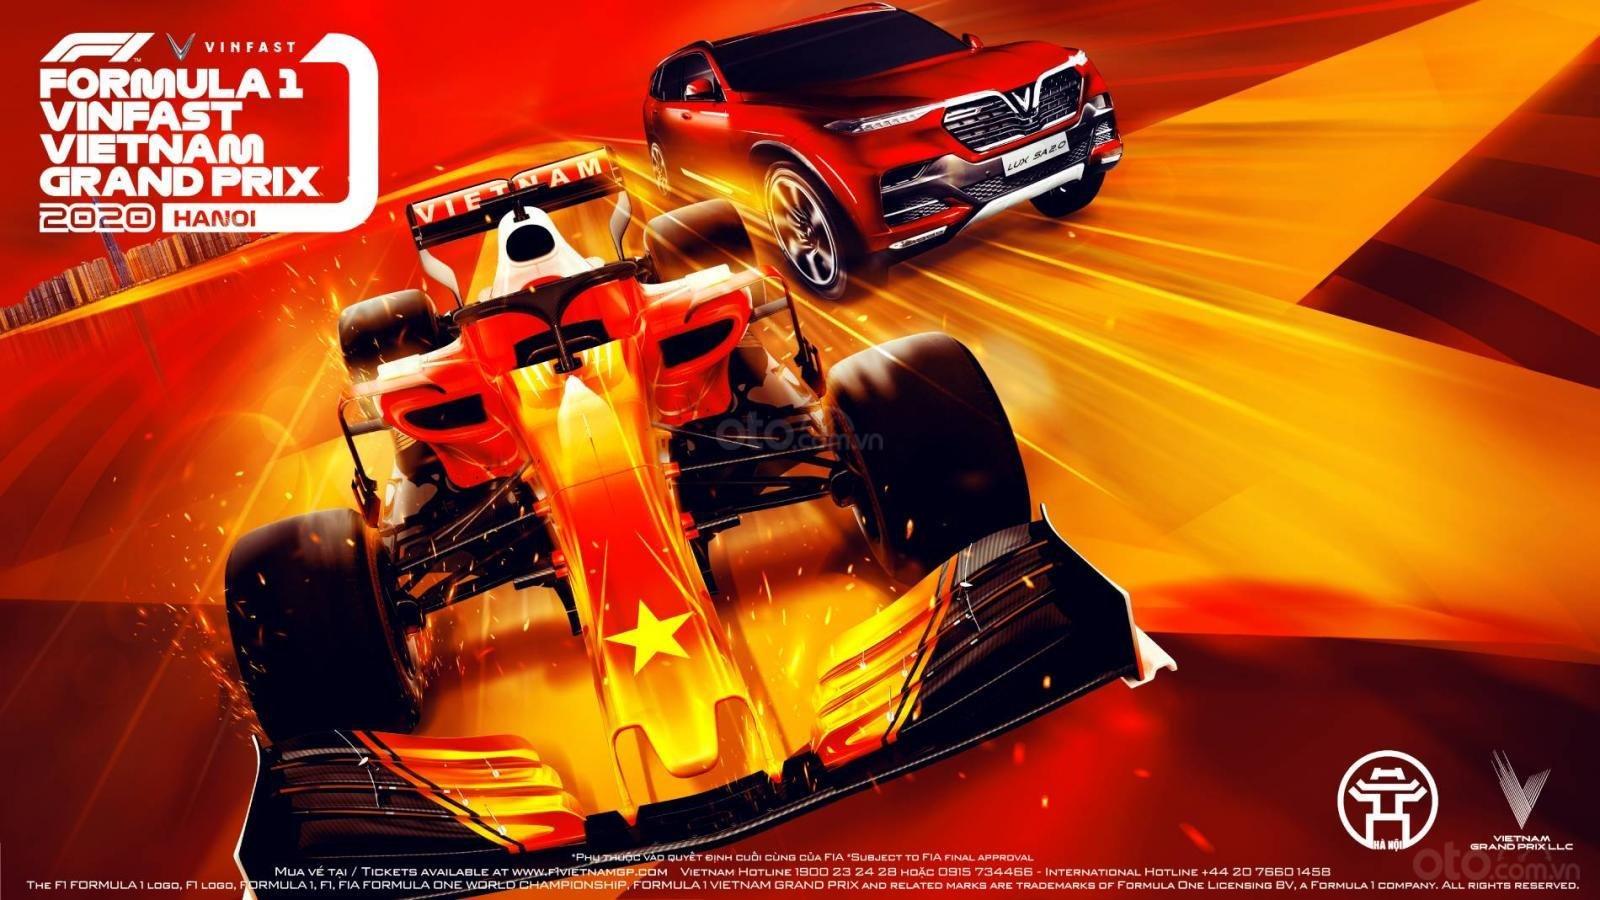 chặng đua Formula 1 VinFast Vietnam Grand Prix.